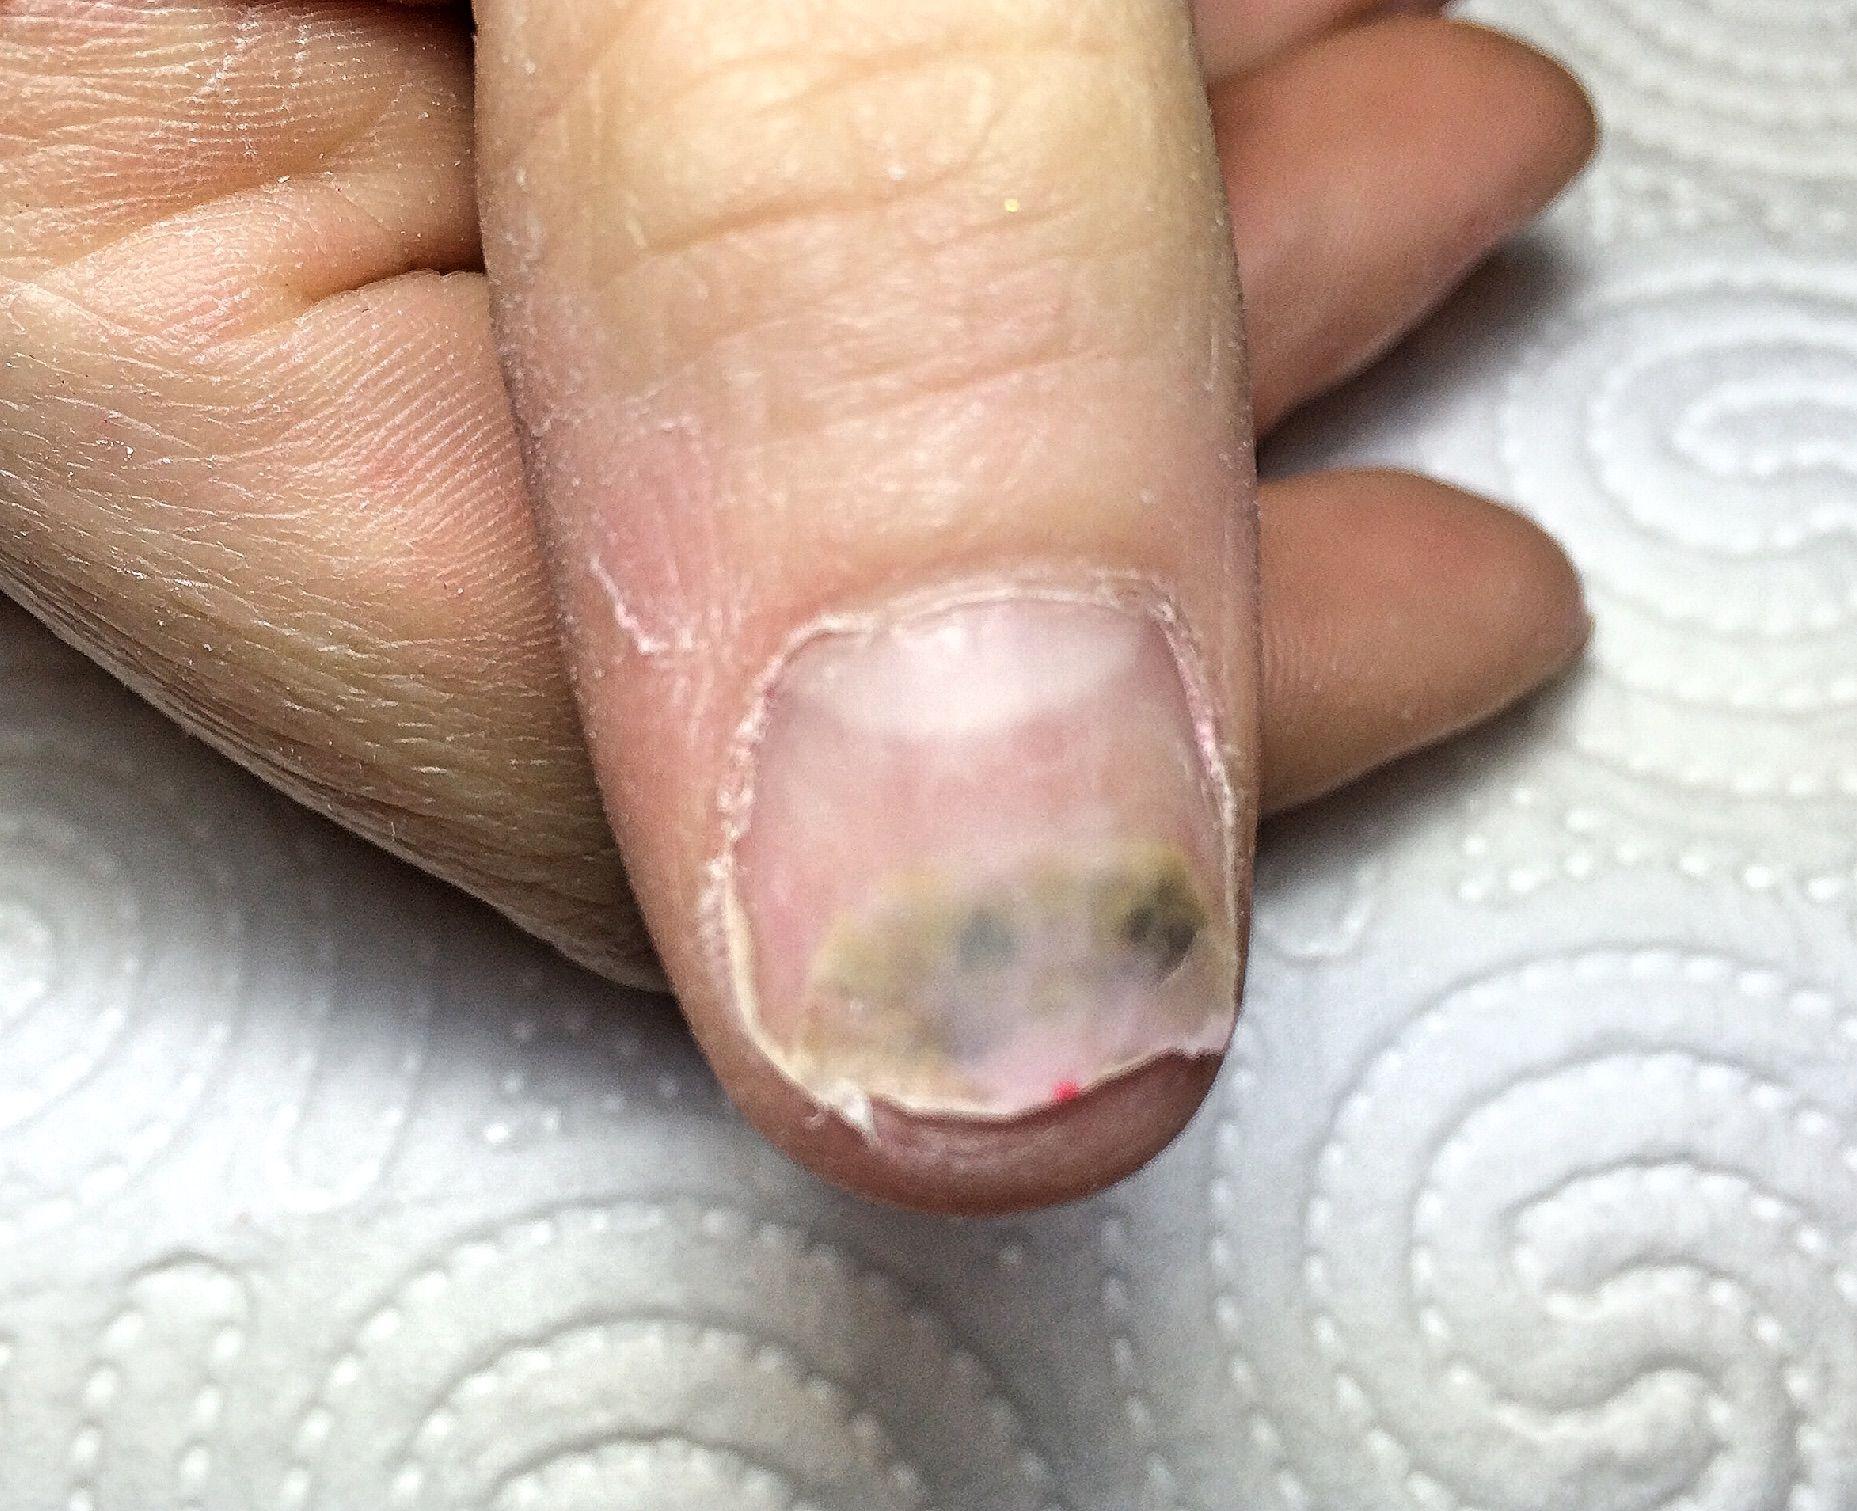 Psoriasi di unghia o fungo